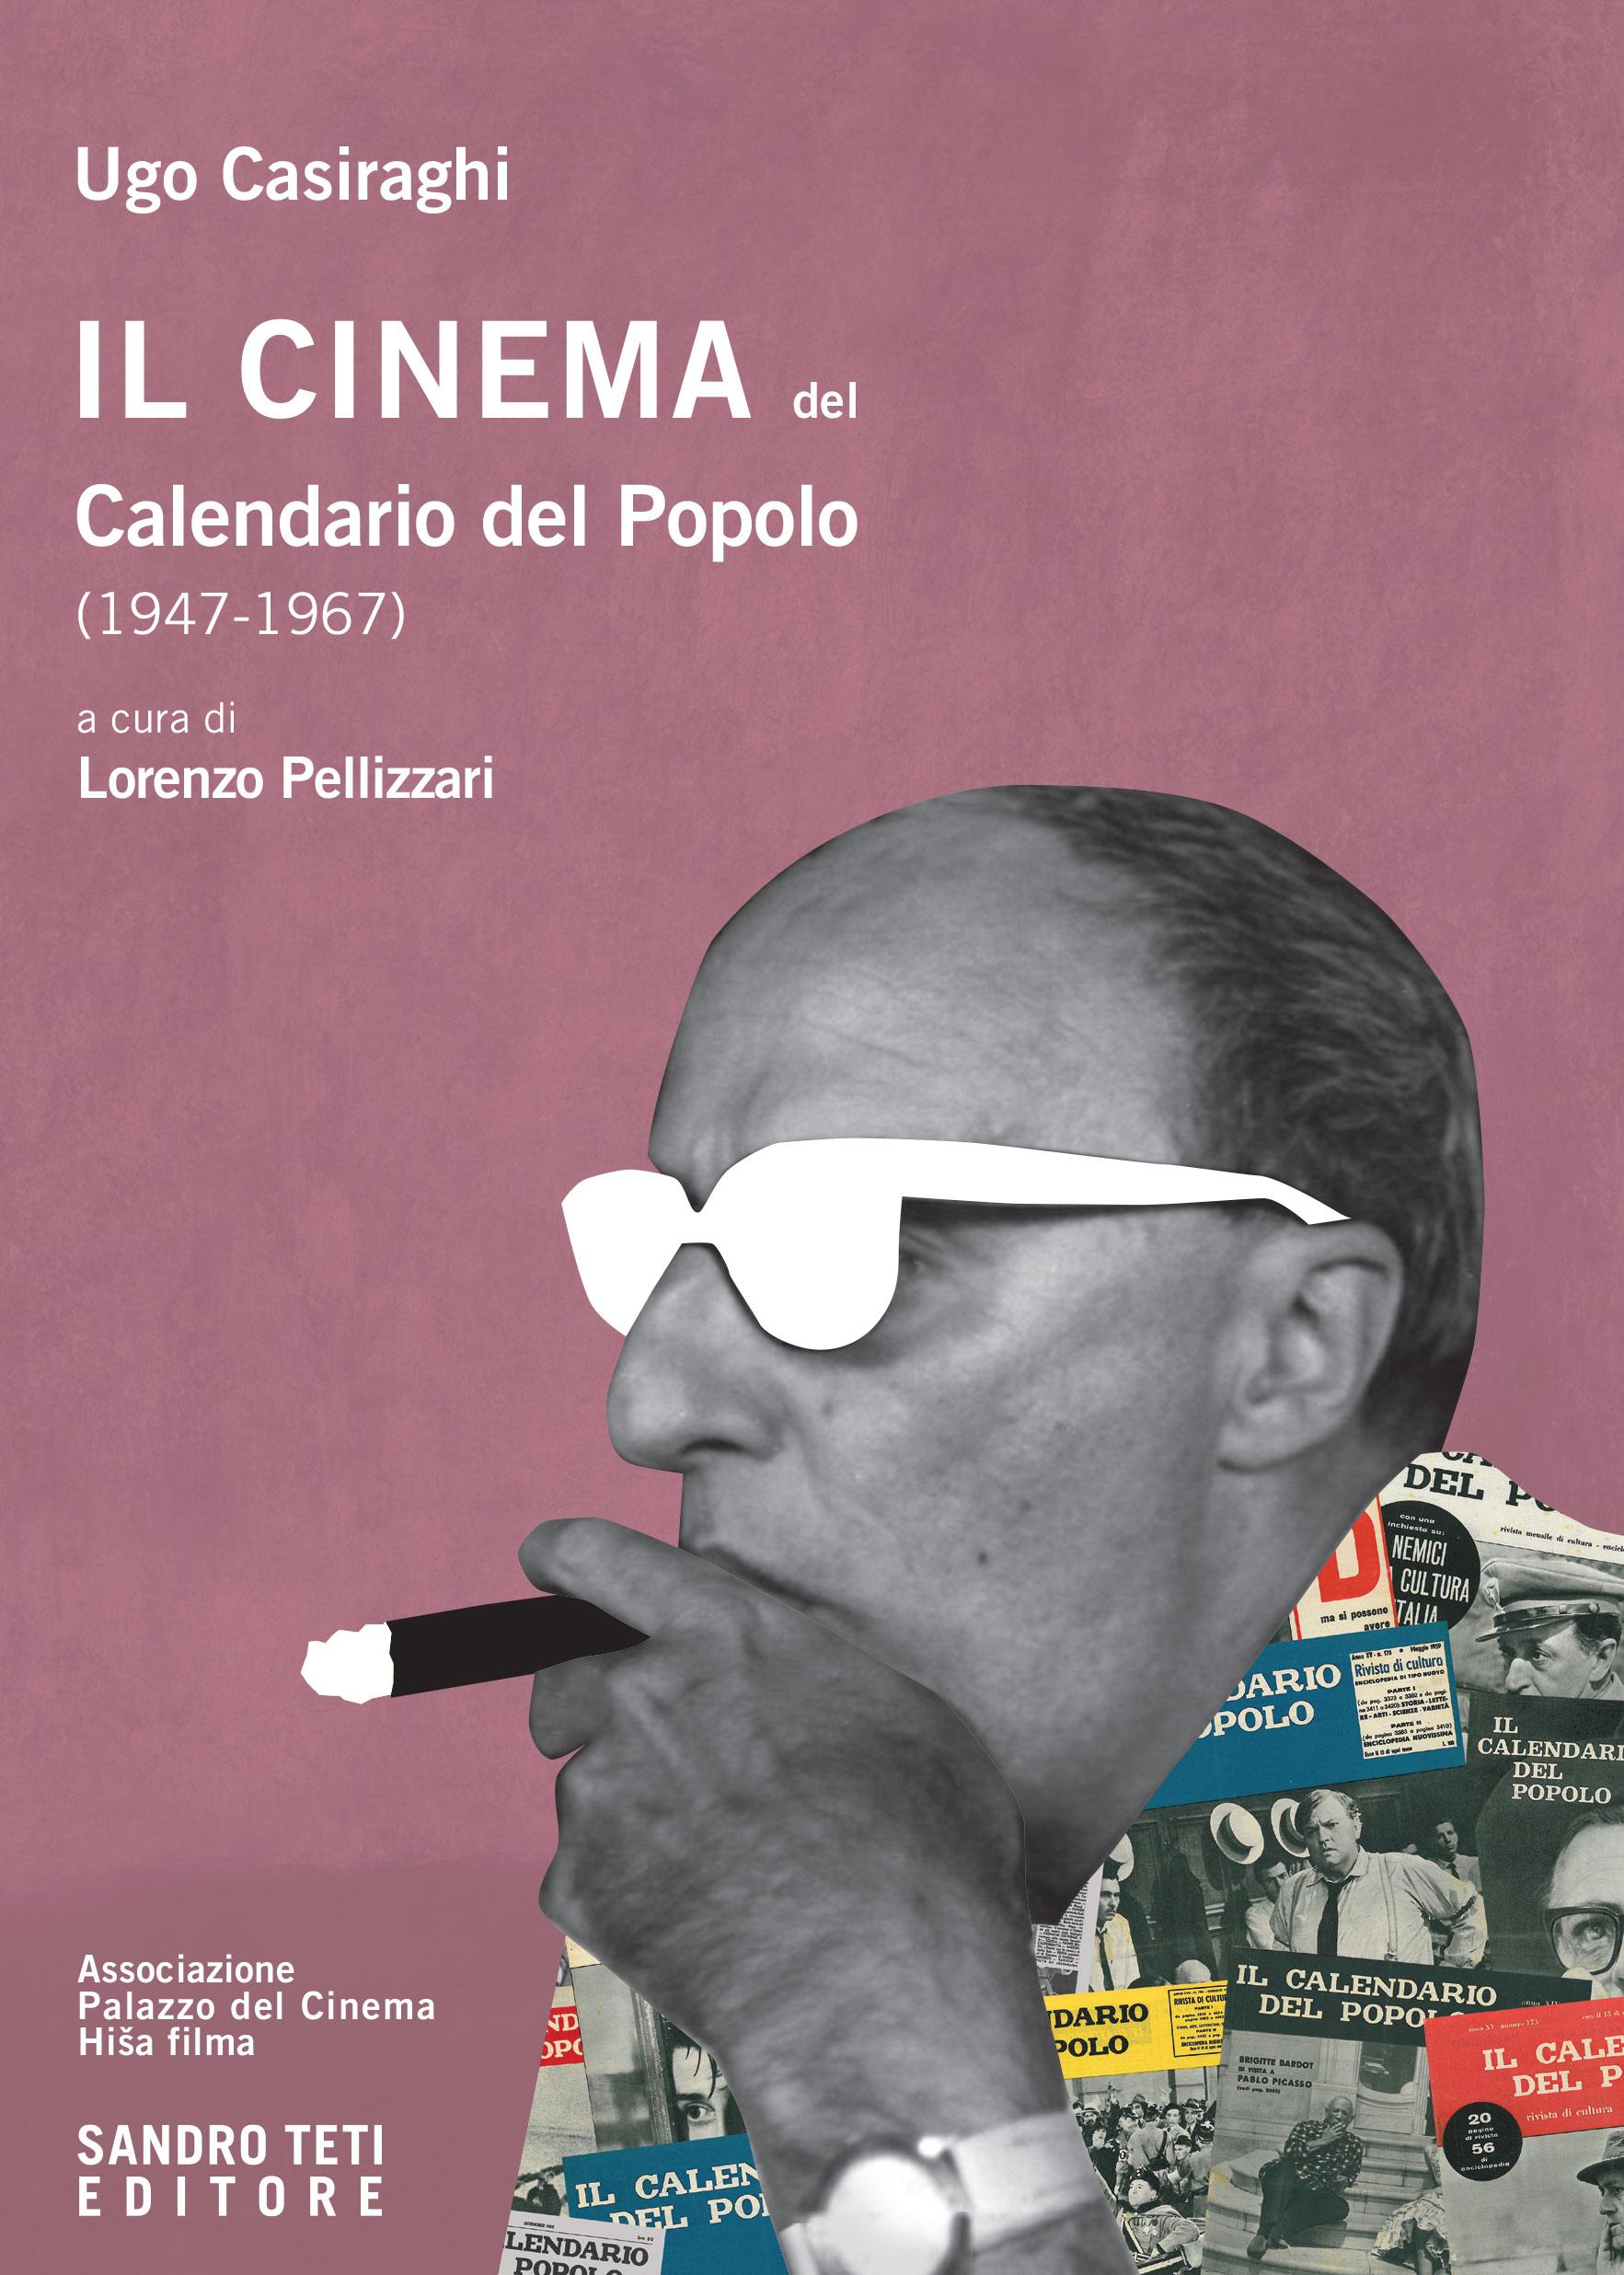 Ugo CasiraghiIl cinema del Calendario del Popolo